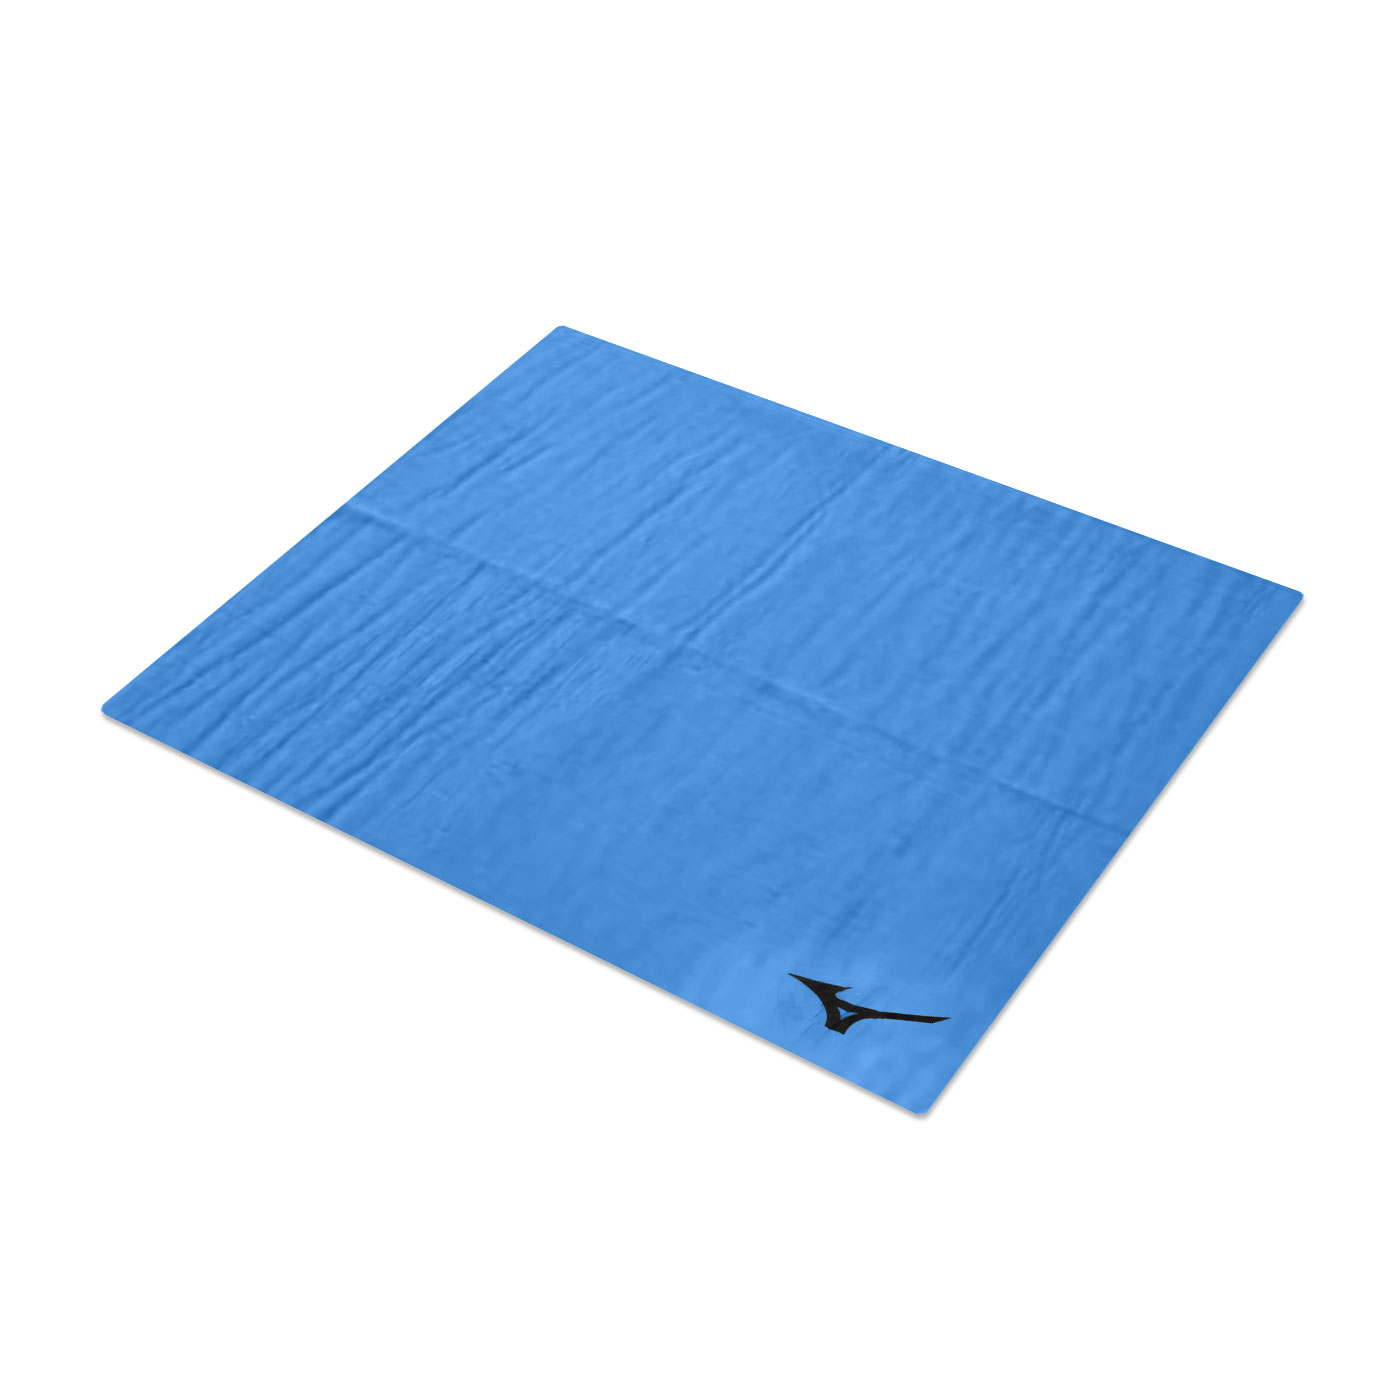 MIZUNO 日製吸水巾  SWIMN2JY801100-27 - 寶藍